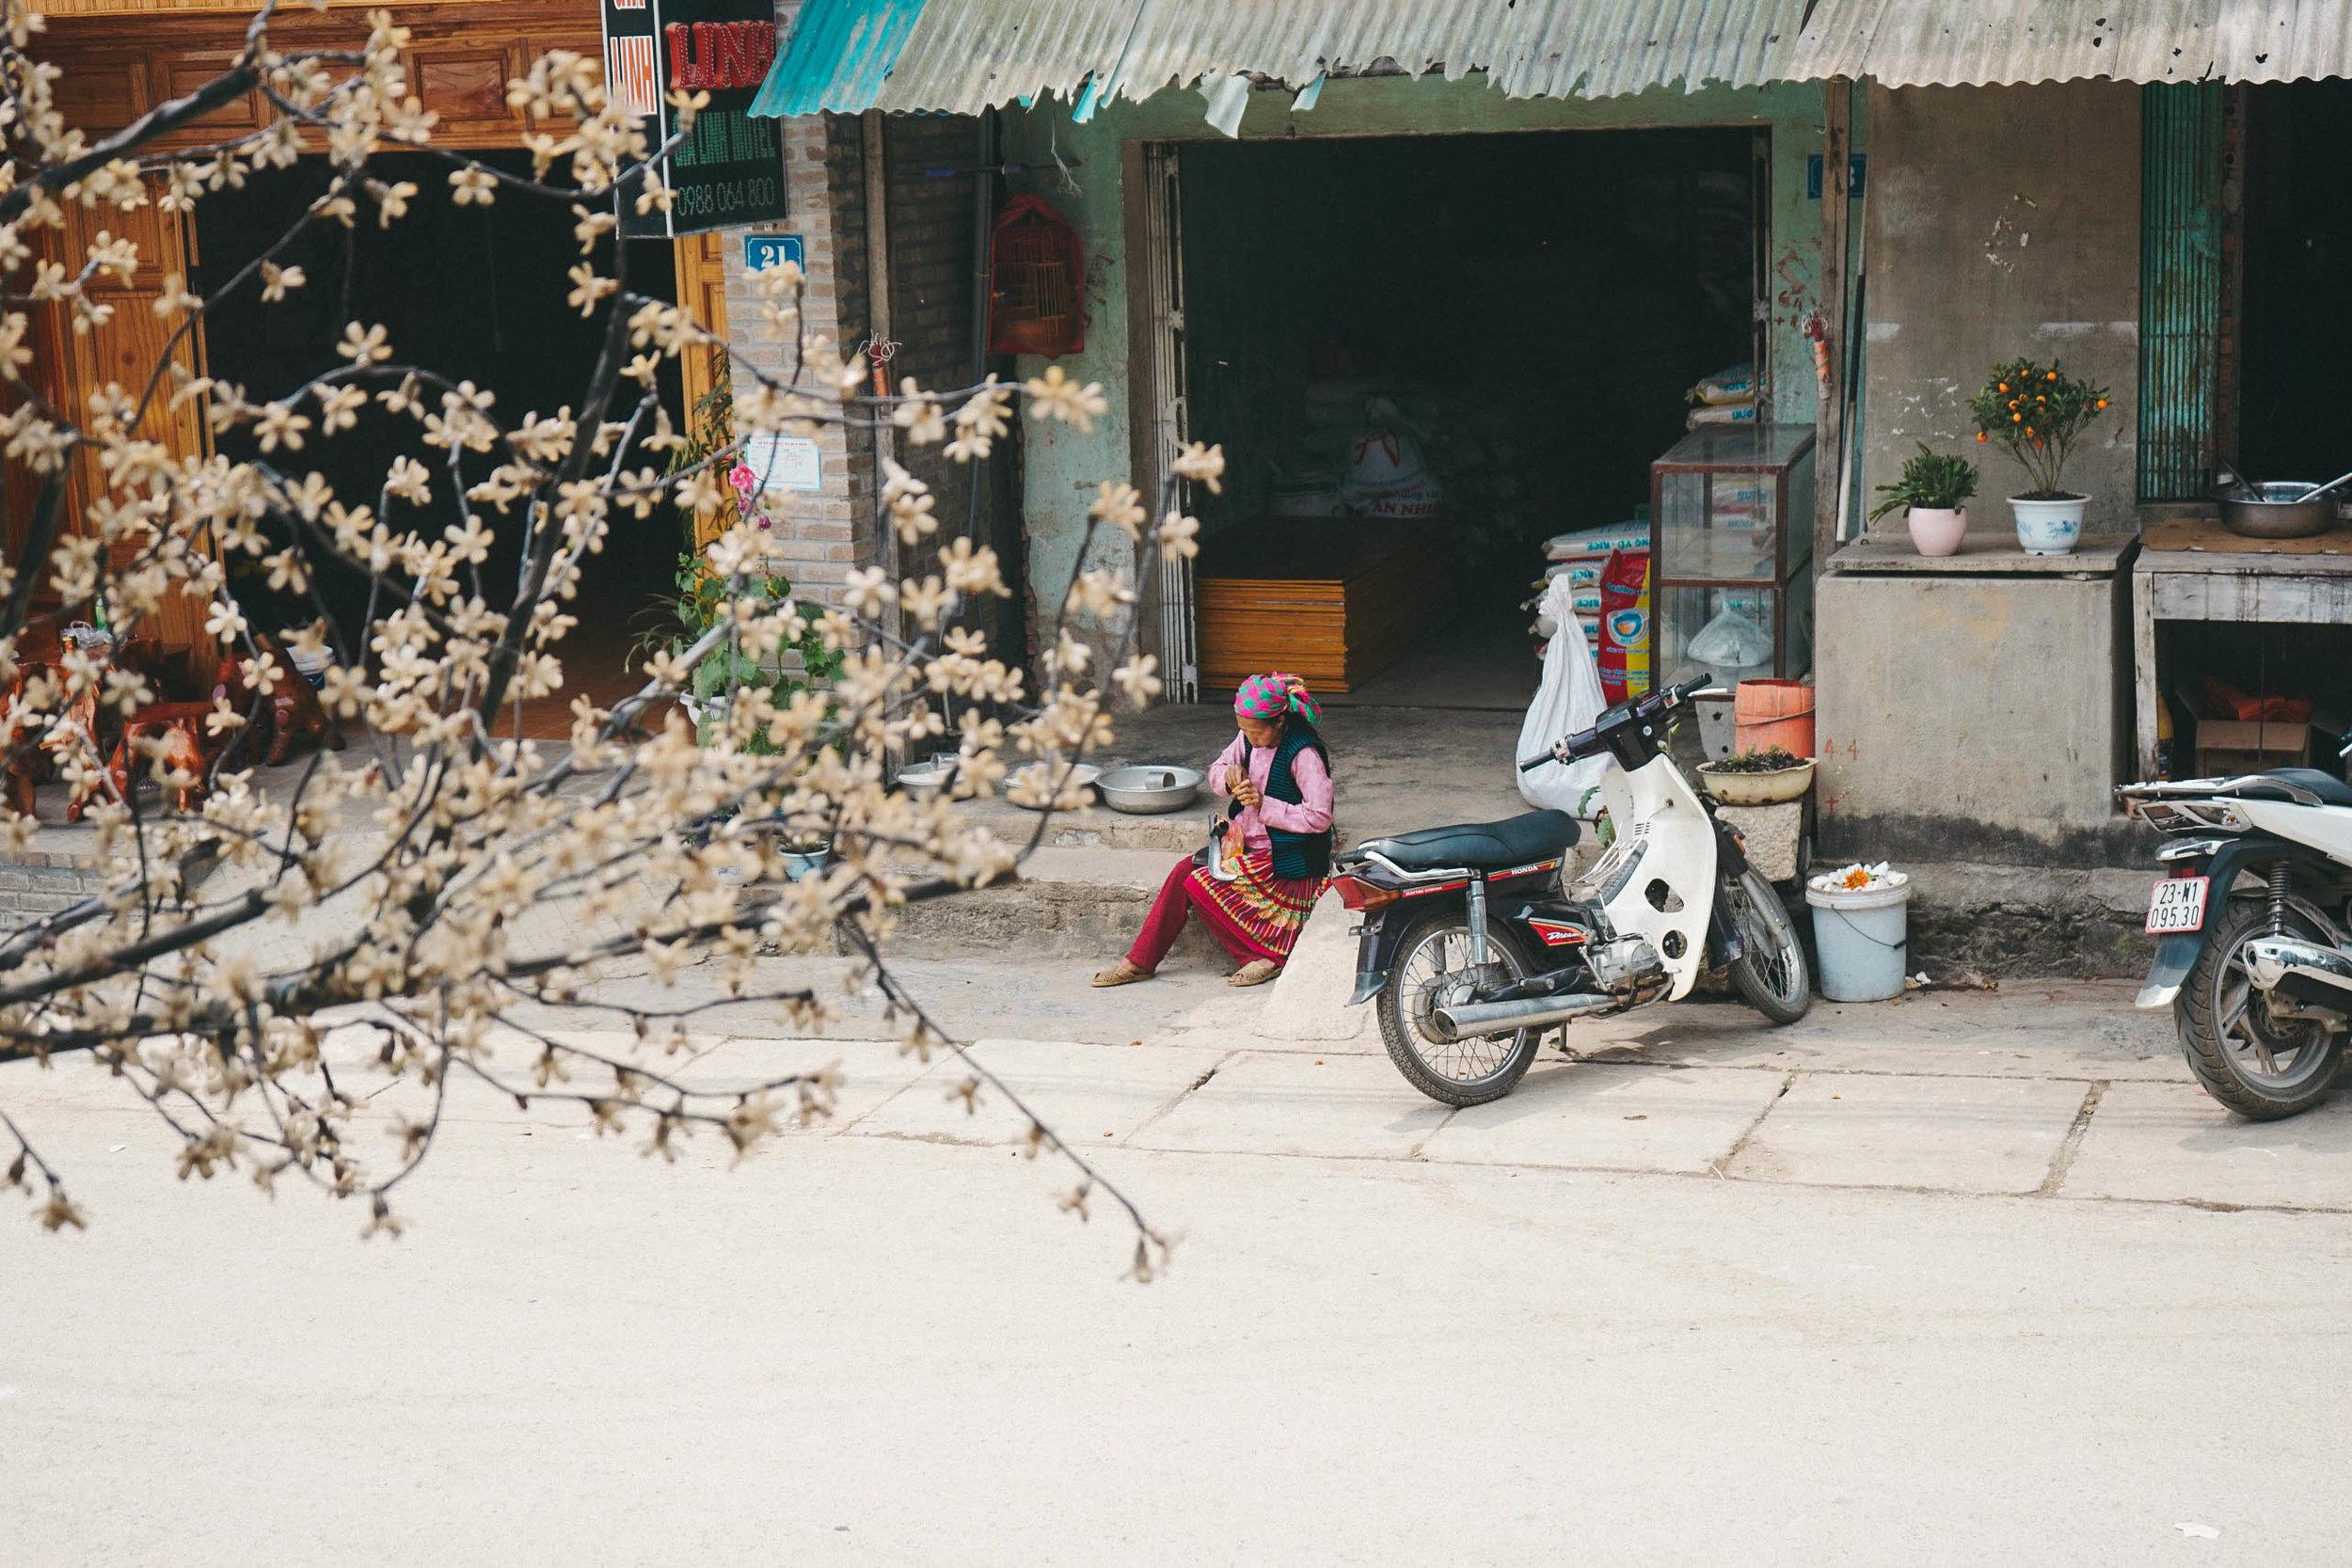 northvietnam-102.jpg